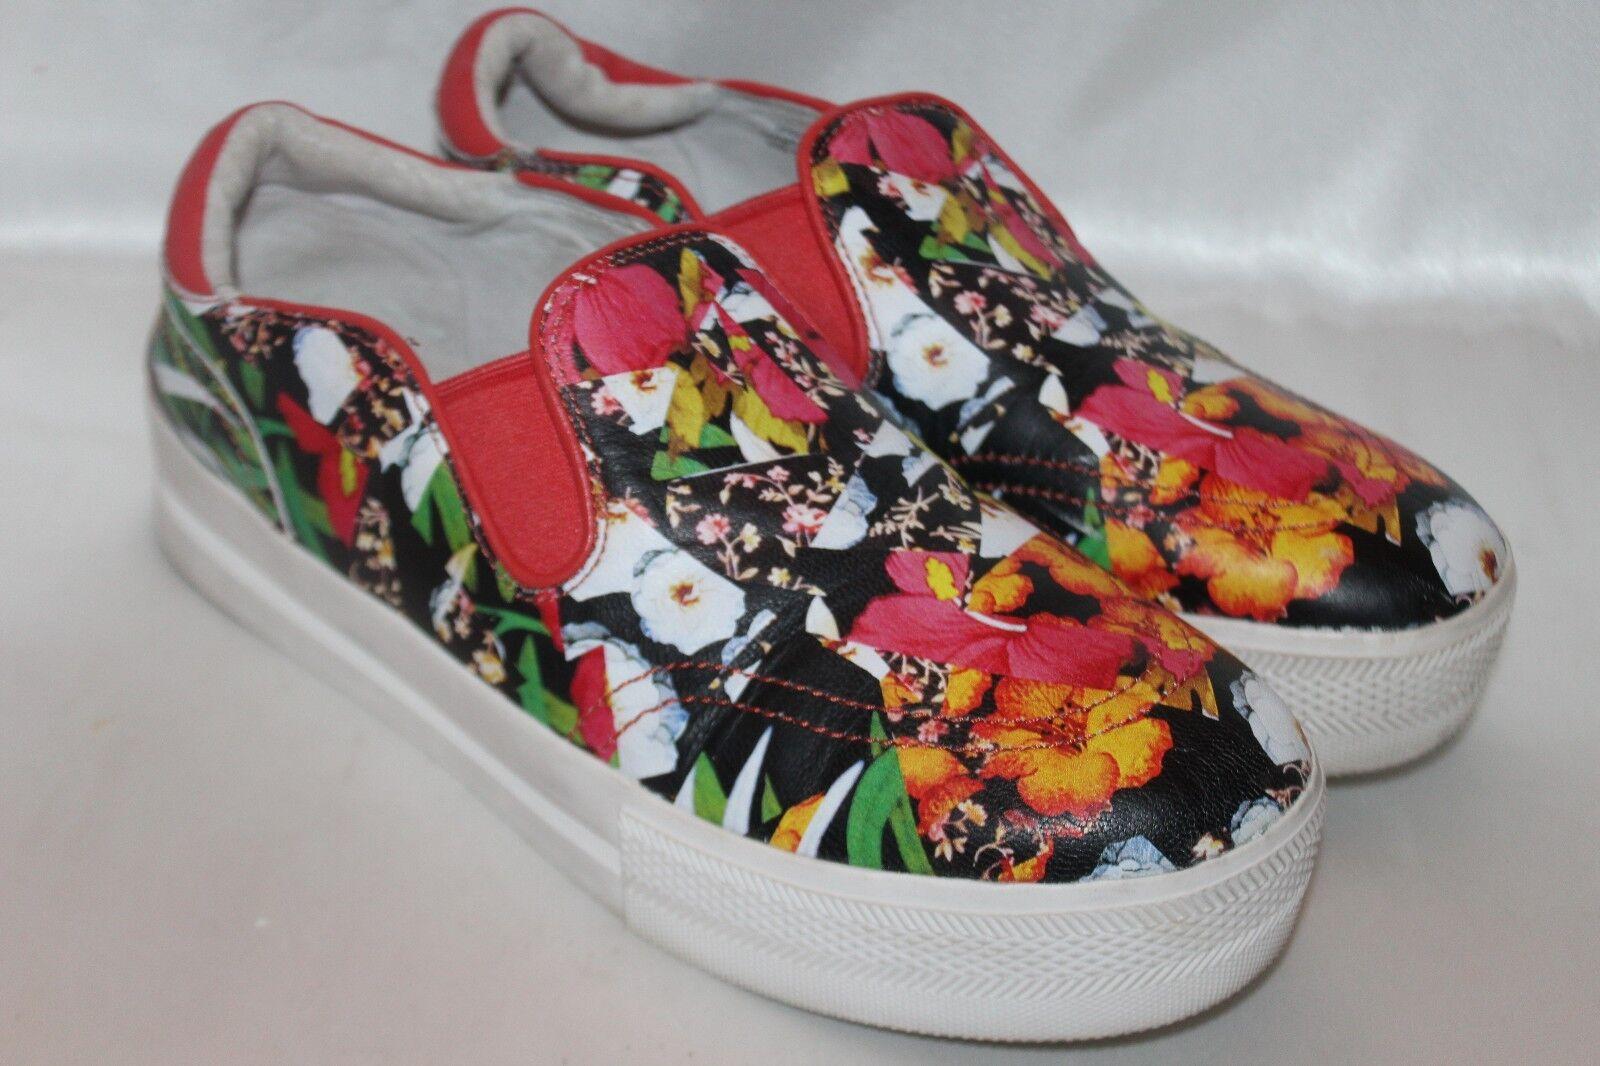 ASH ASH ASH Coral Multi Leather JUNGLE Slip On Sneaker Loafer Sz 9 EU40  180 54490c